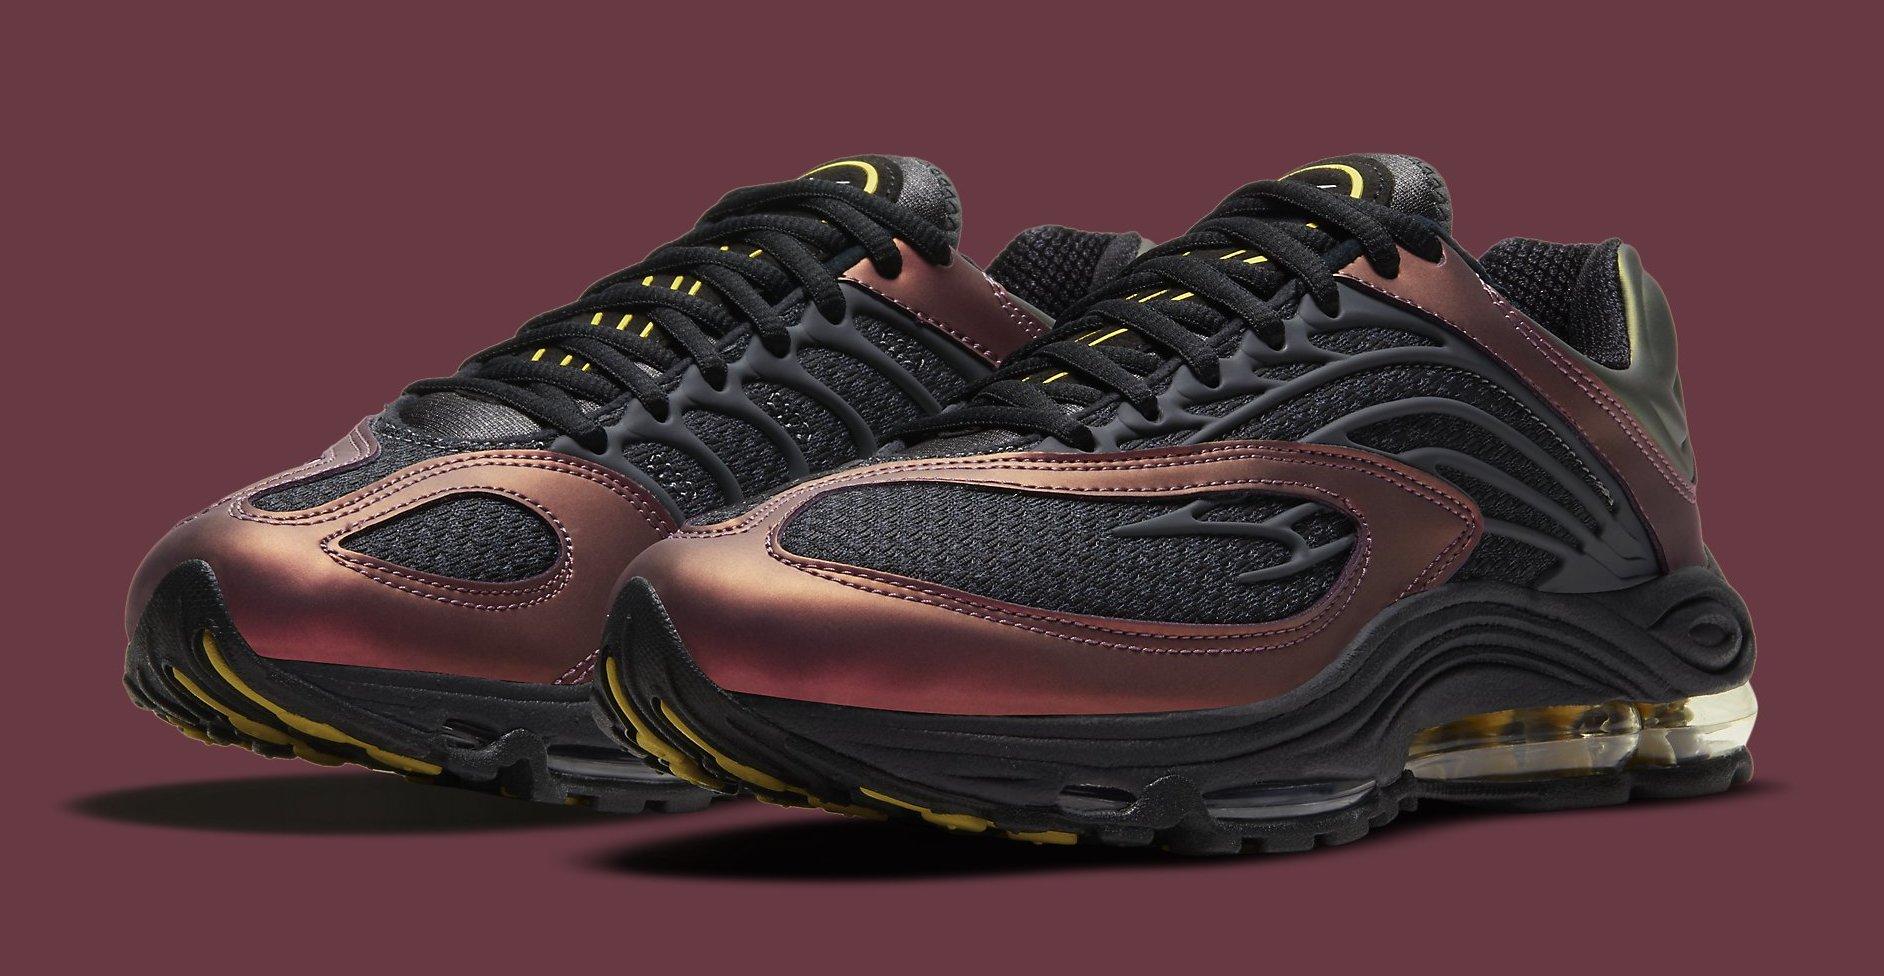 Nike Air Tuned Max Black/Celery/Dark Charcoal CV6984-001 ...